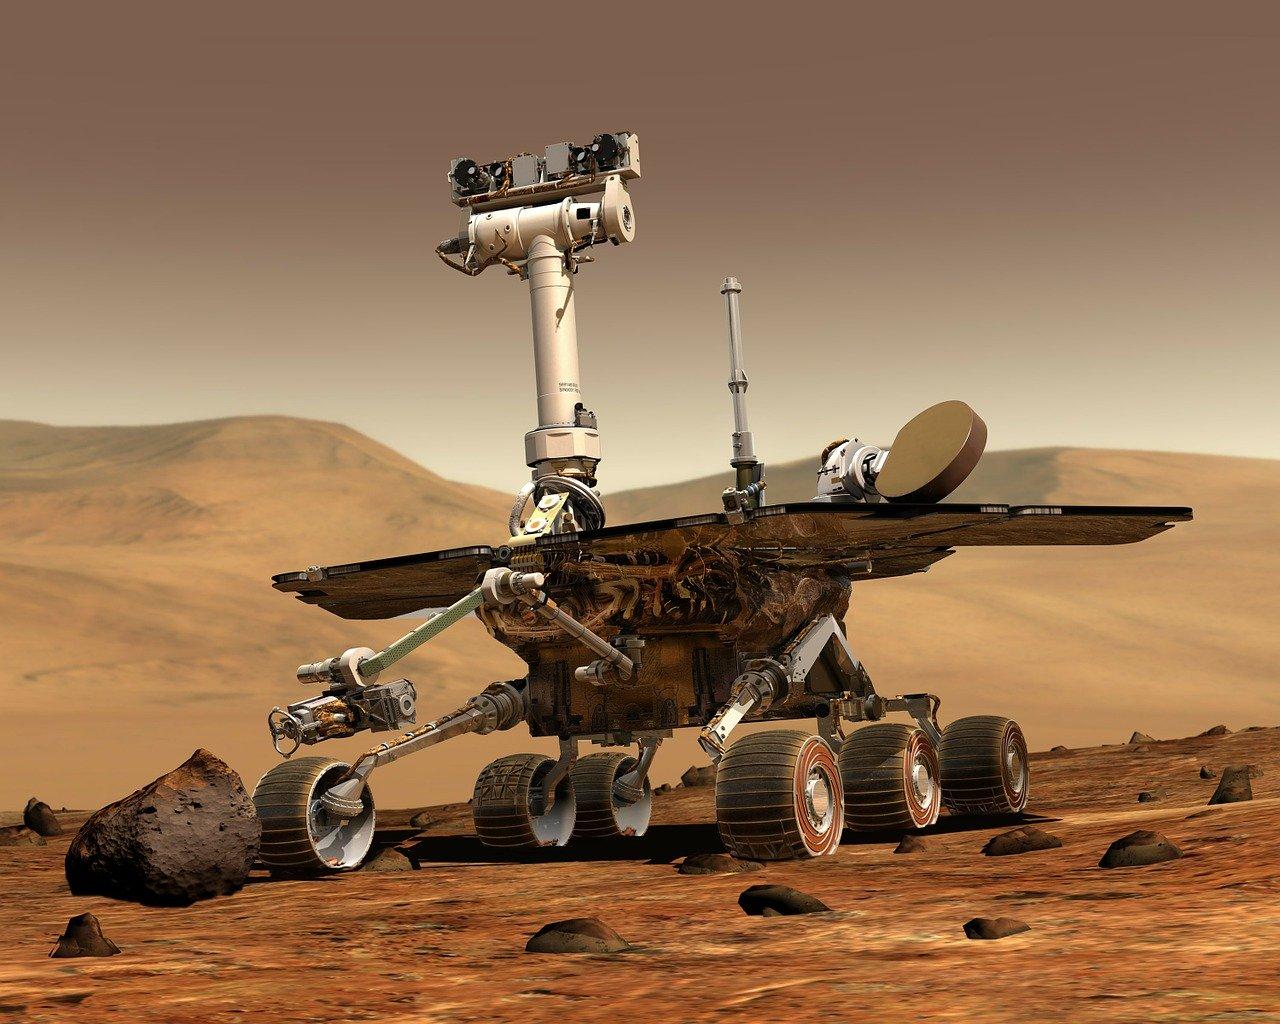 mars, mars rover, space travel